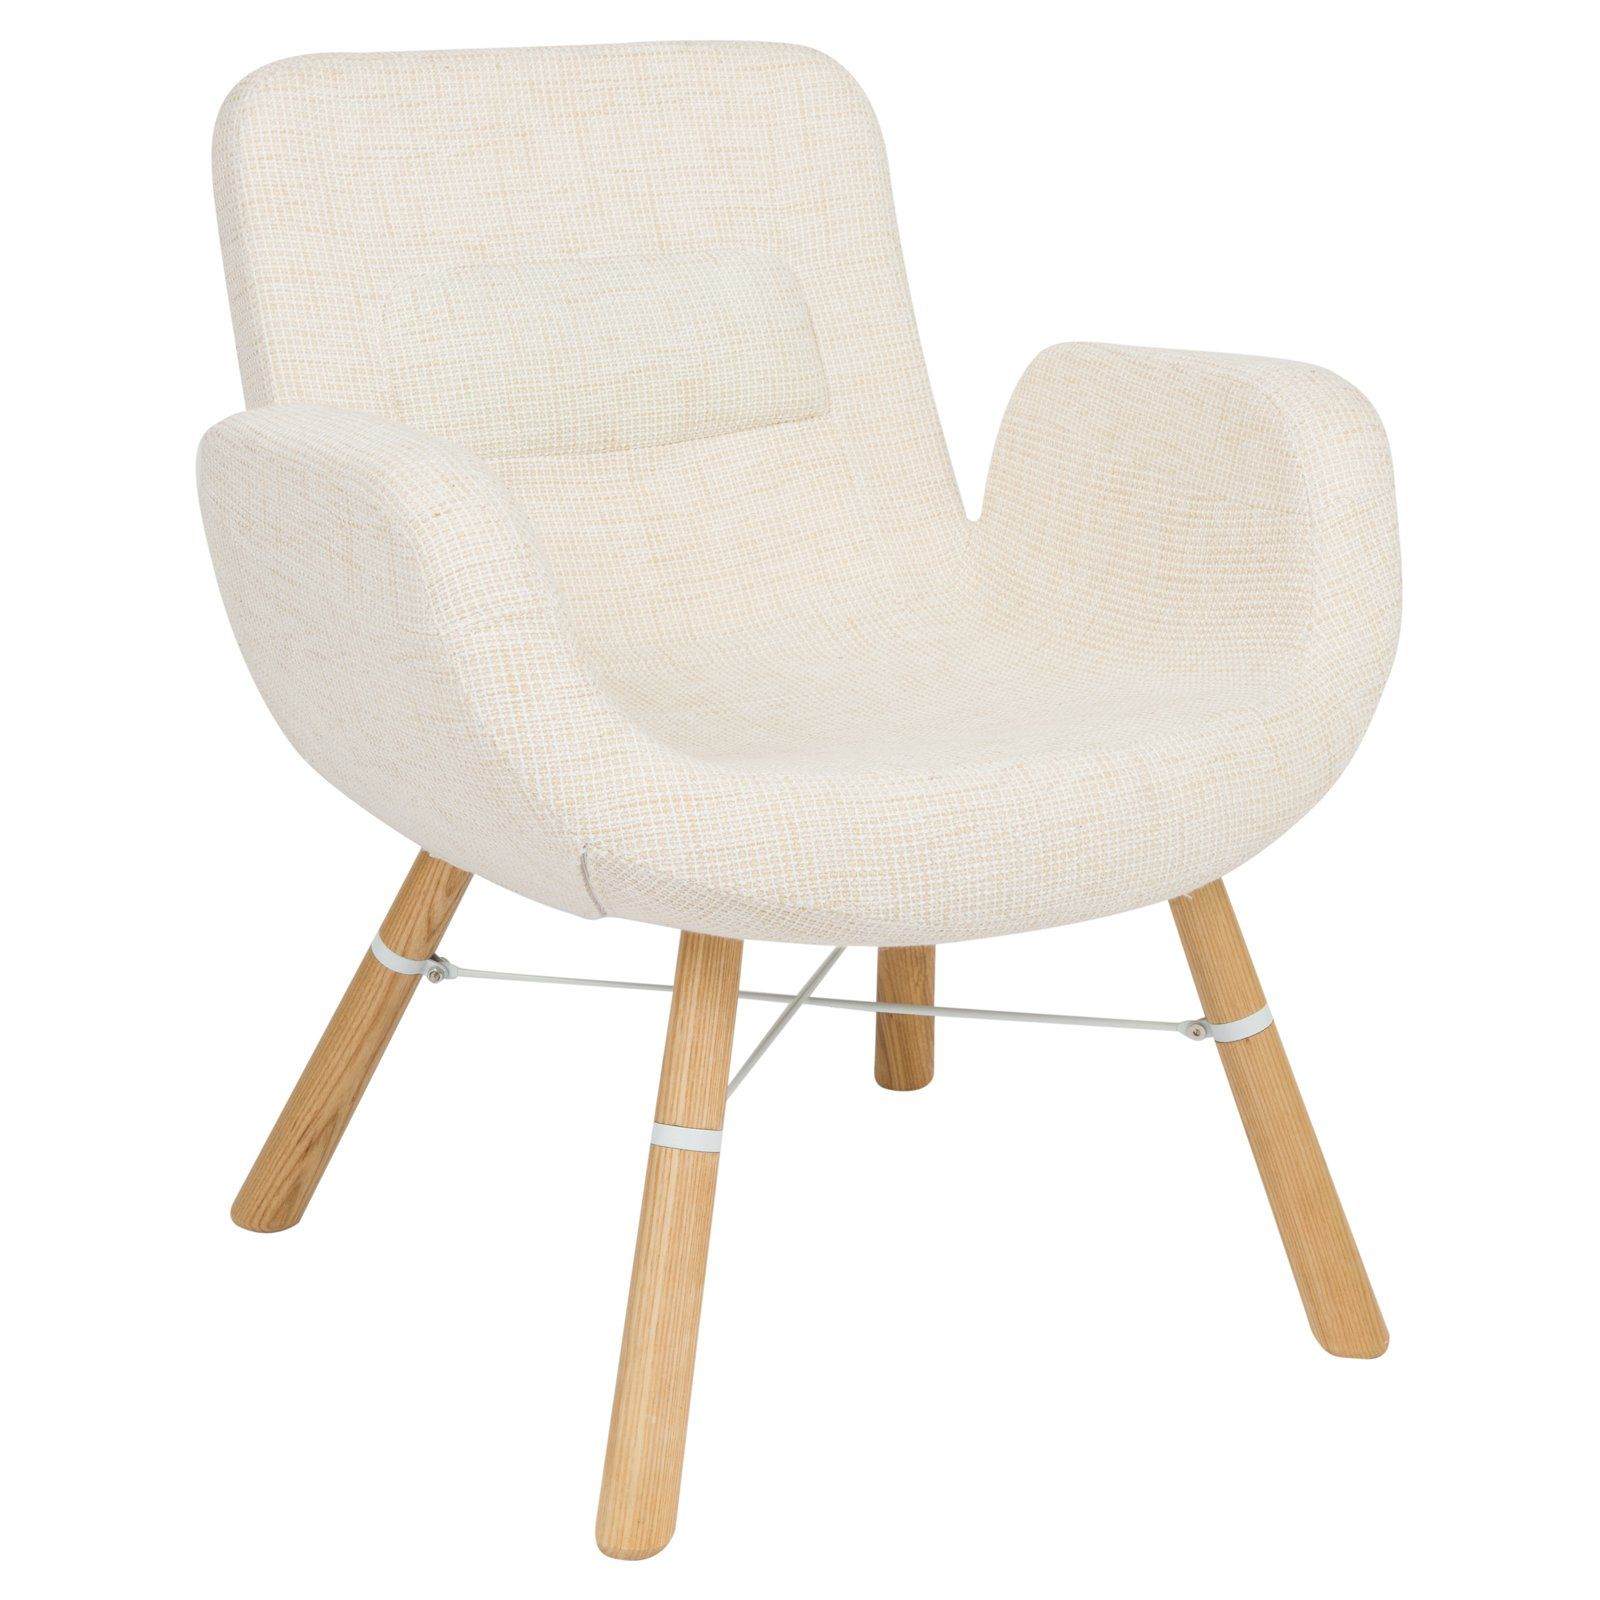 LeisureMod Milwood Ergonomic Accent Lounge Chair Gray